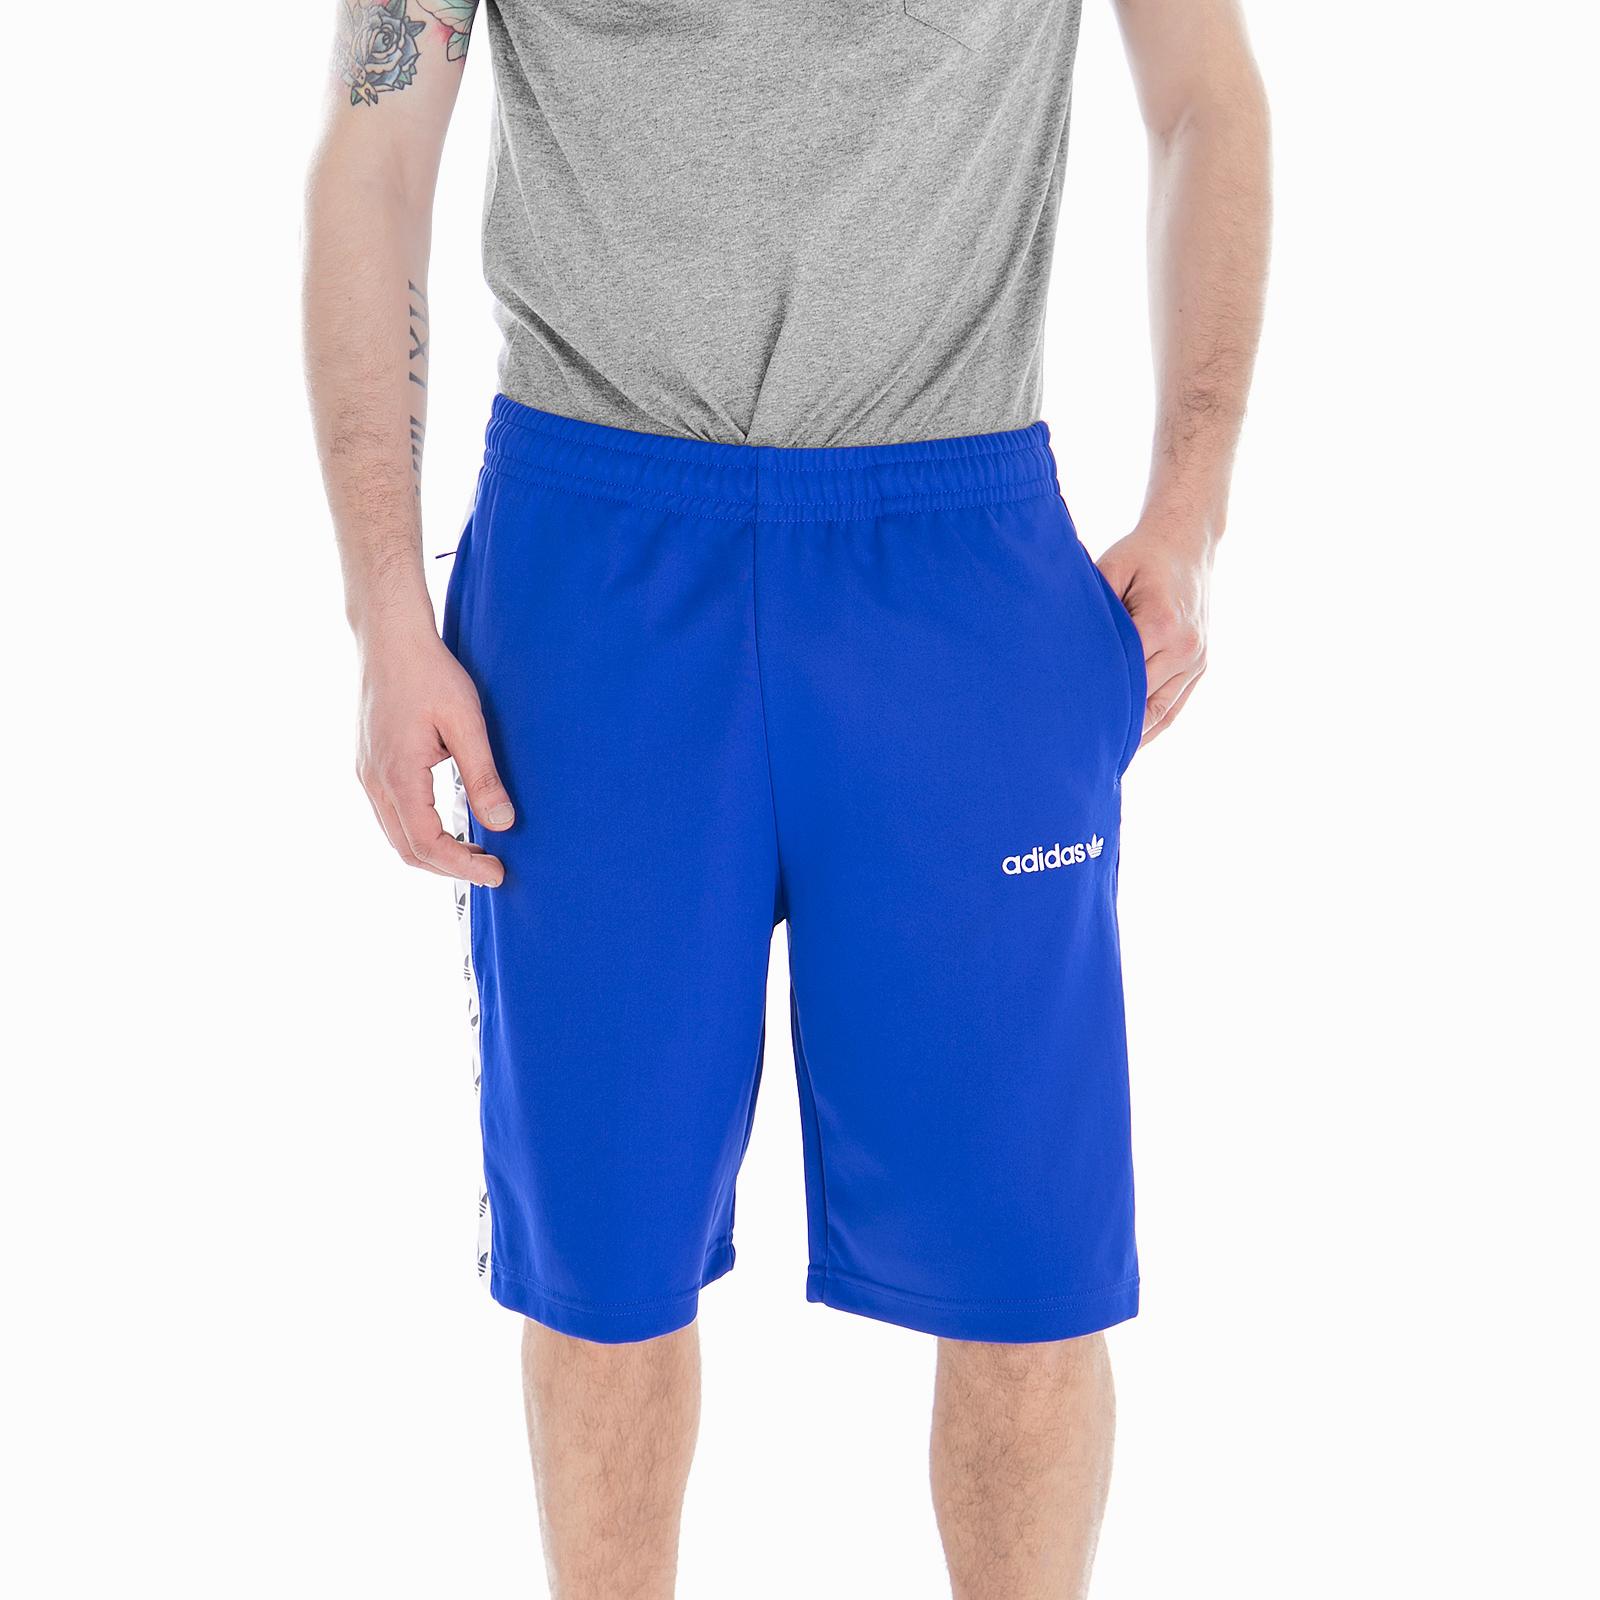 fa1ef809481c Adidas Shorts Tnt Short Boblue White Blue